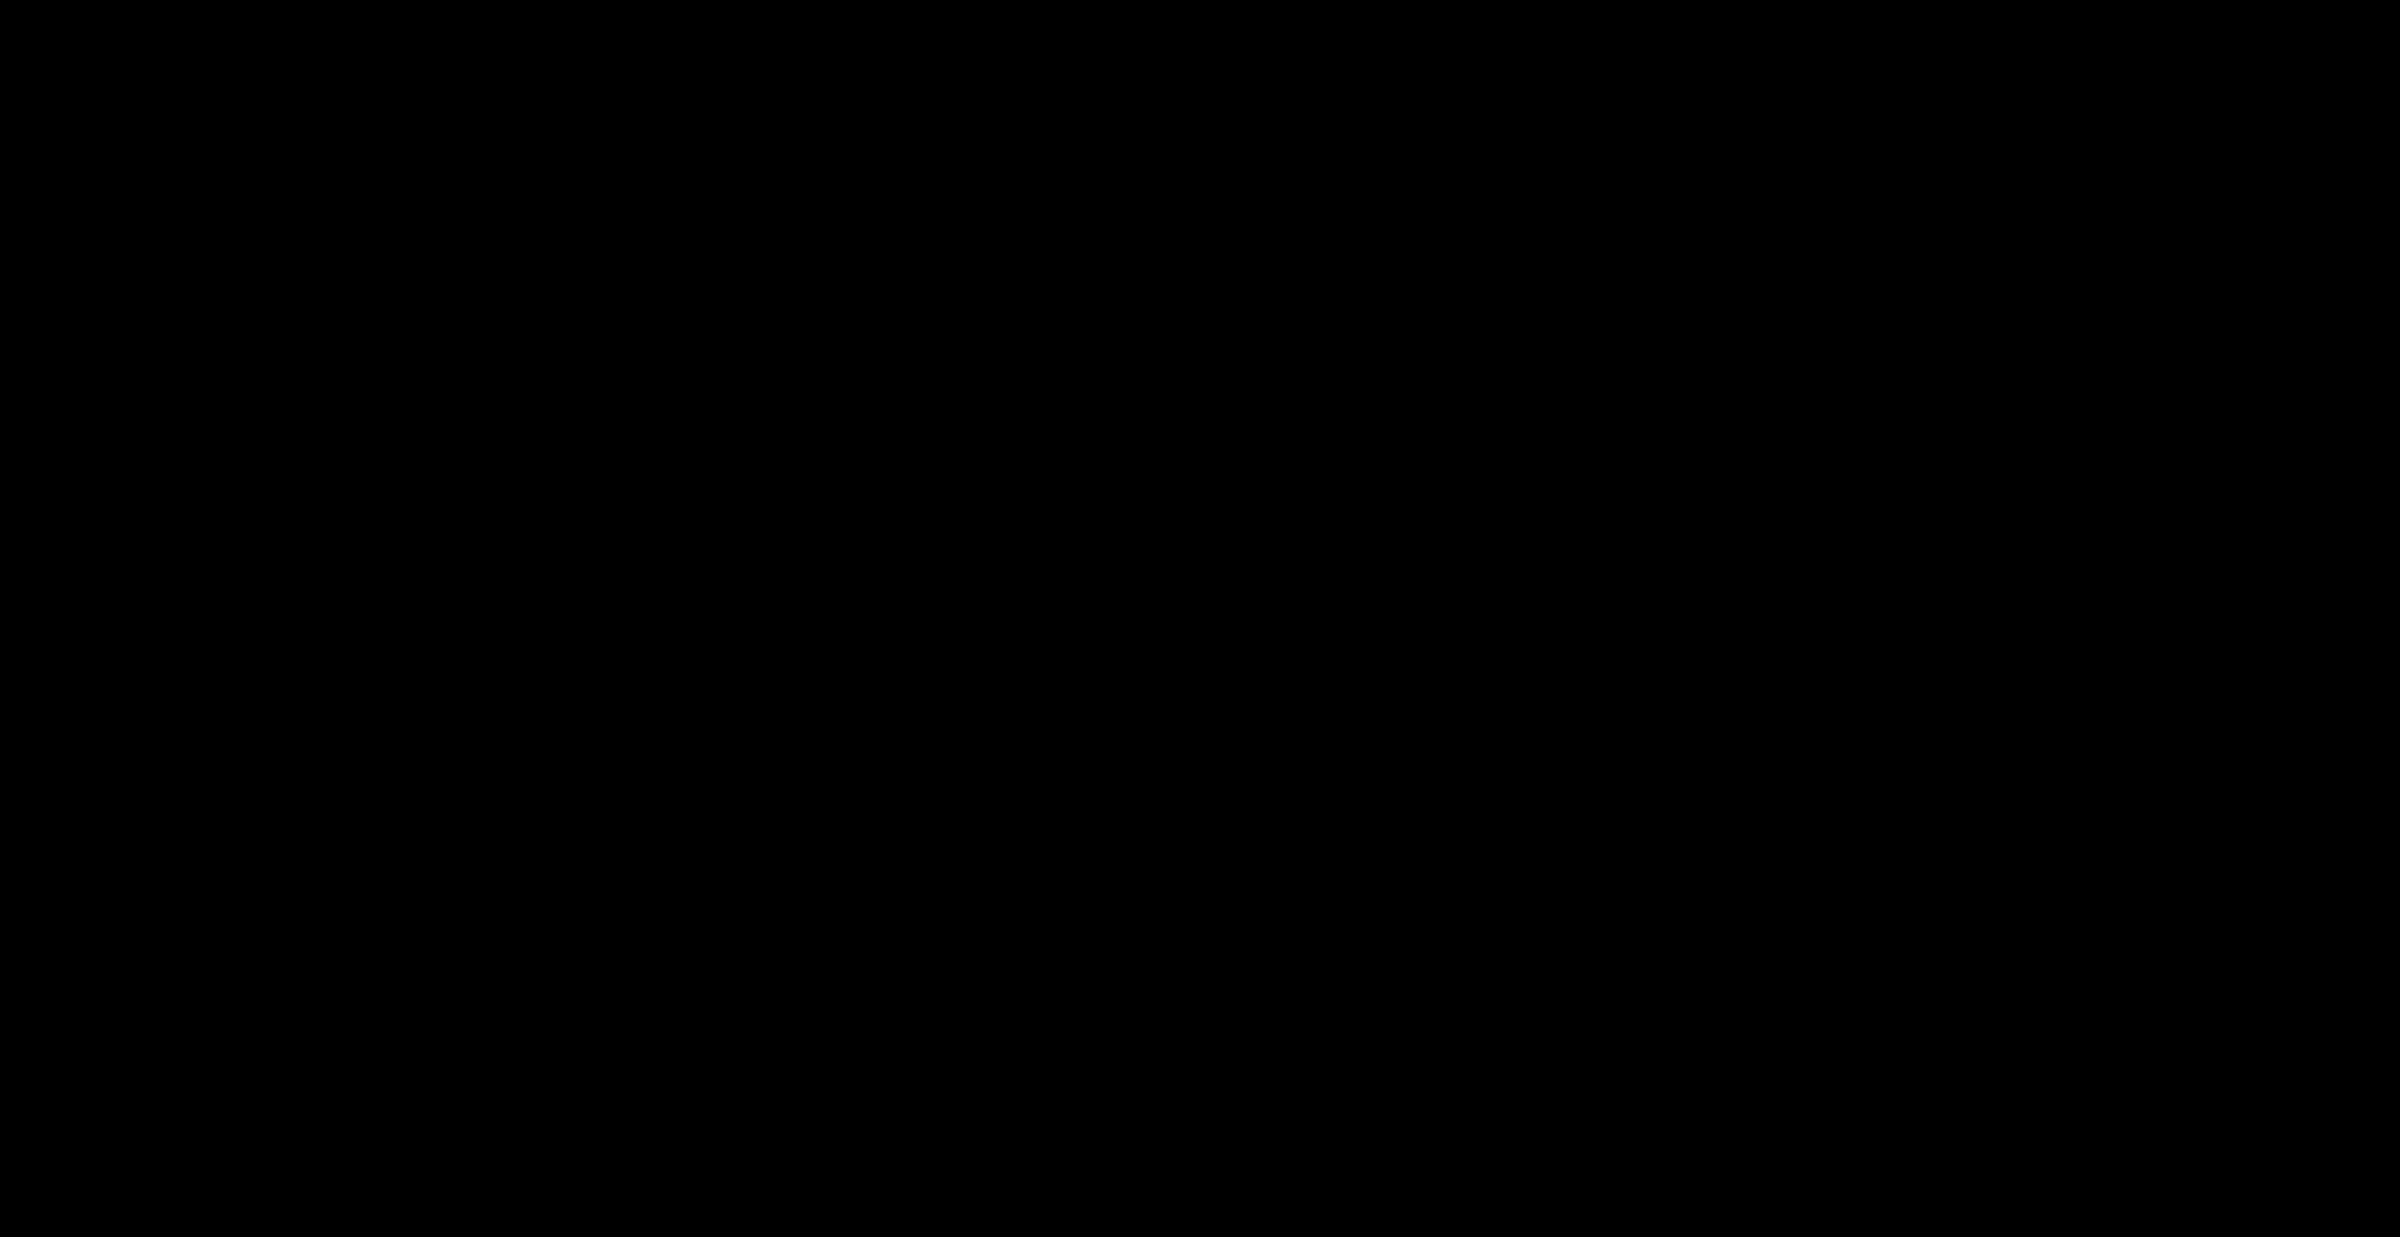 Head silhouette at getdrawings. Clipart pig fetal pig